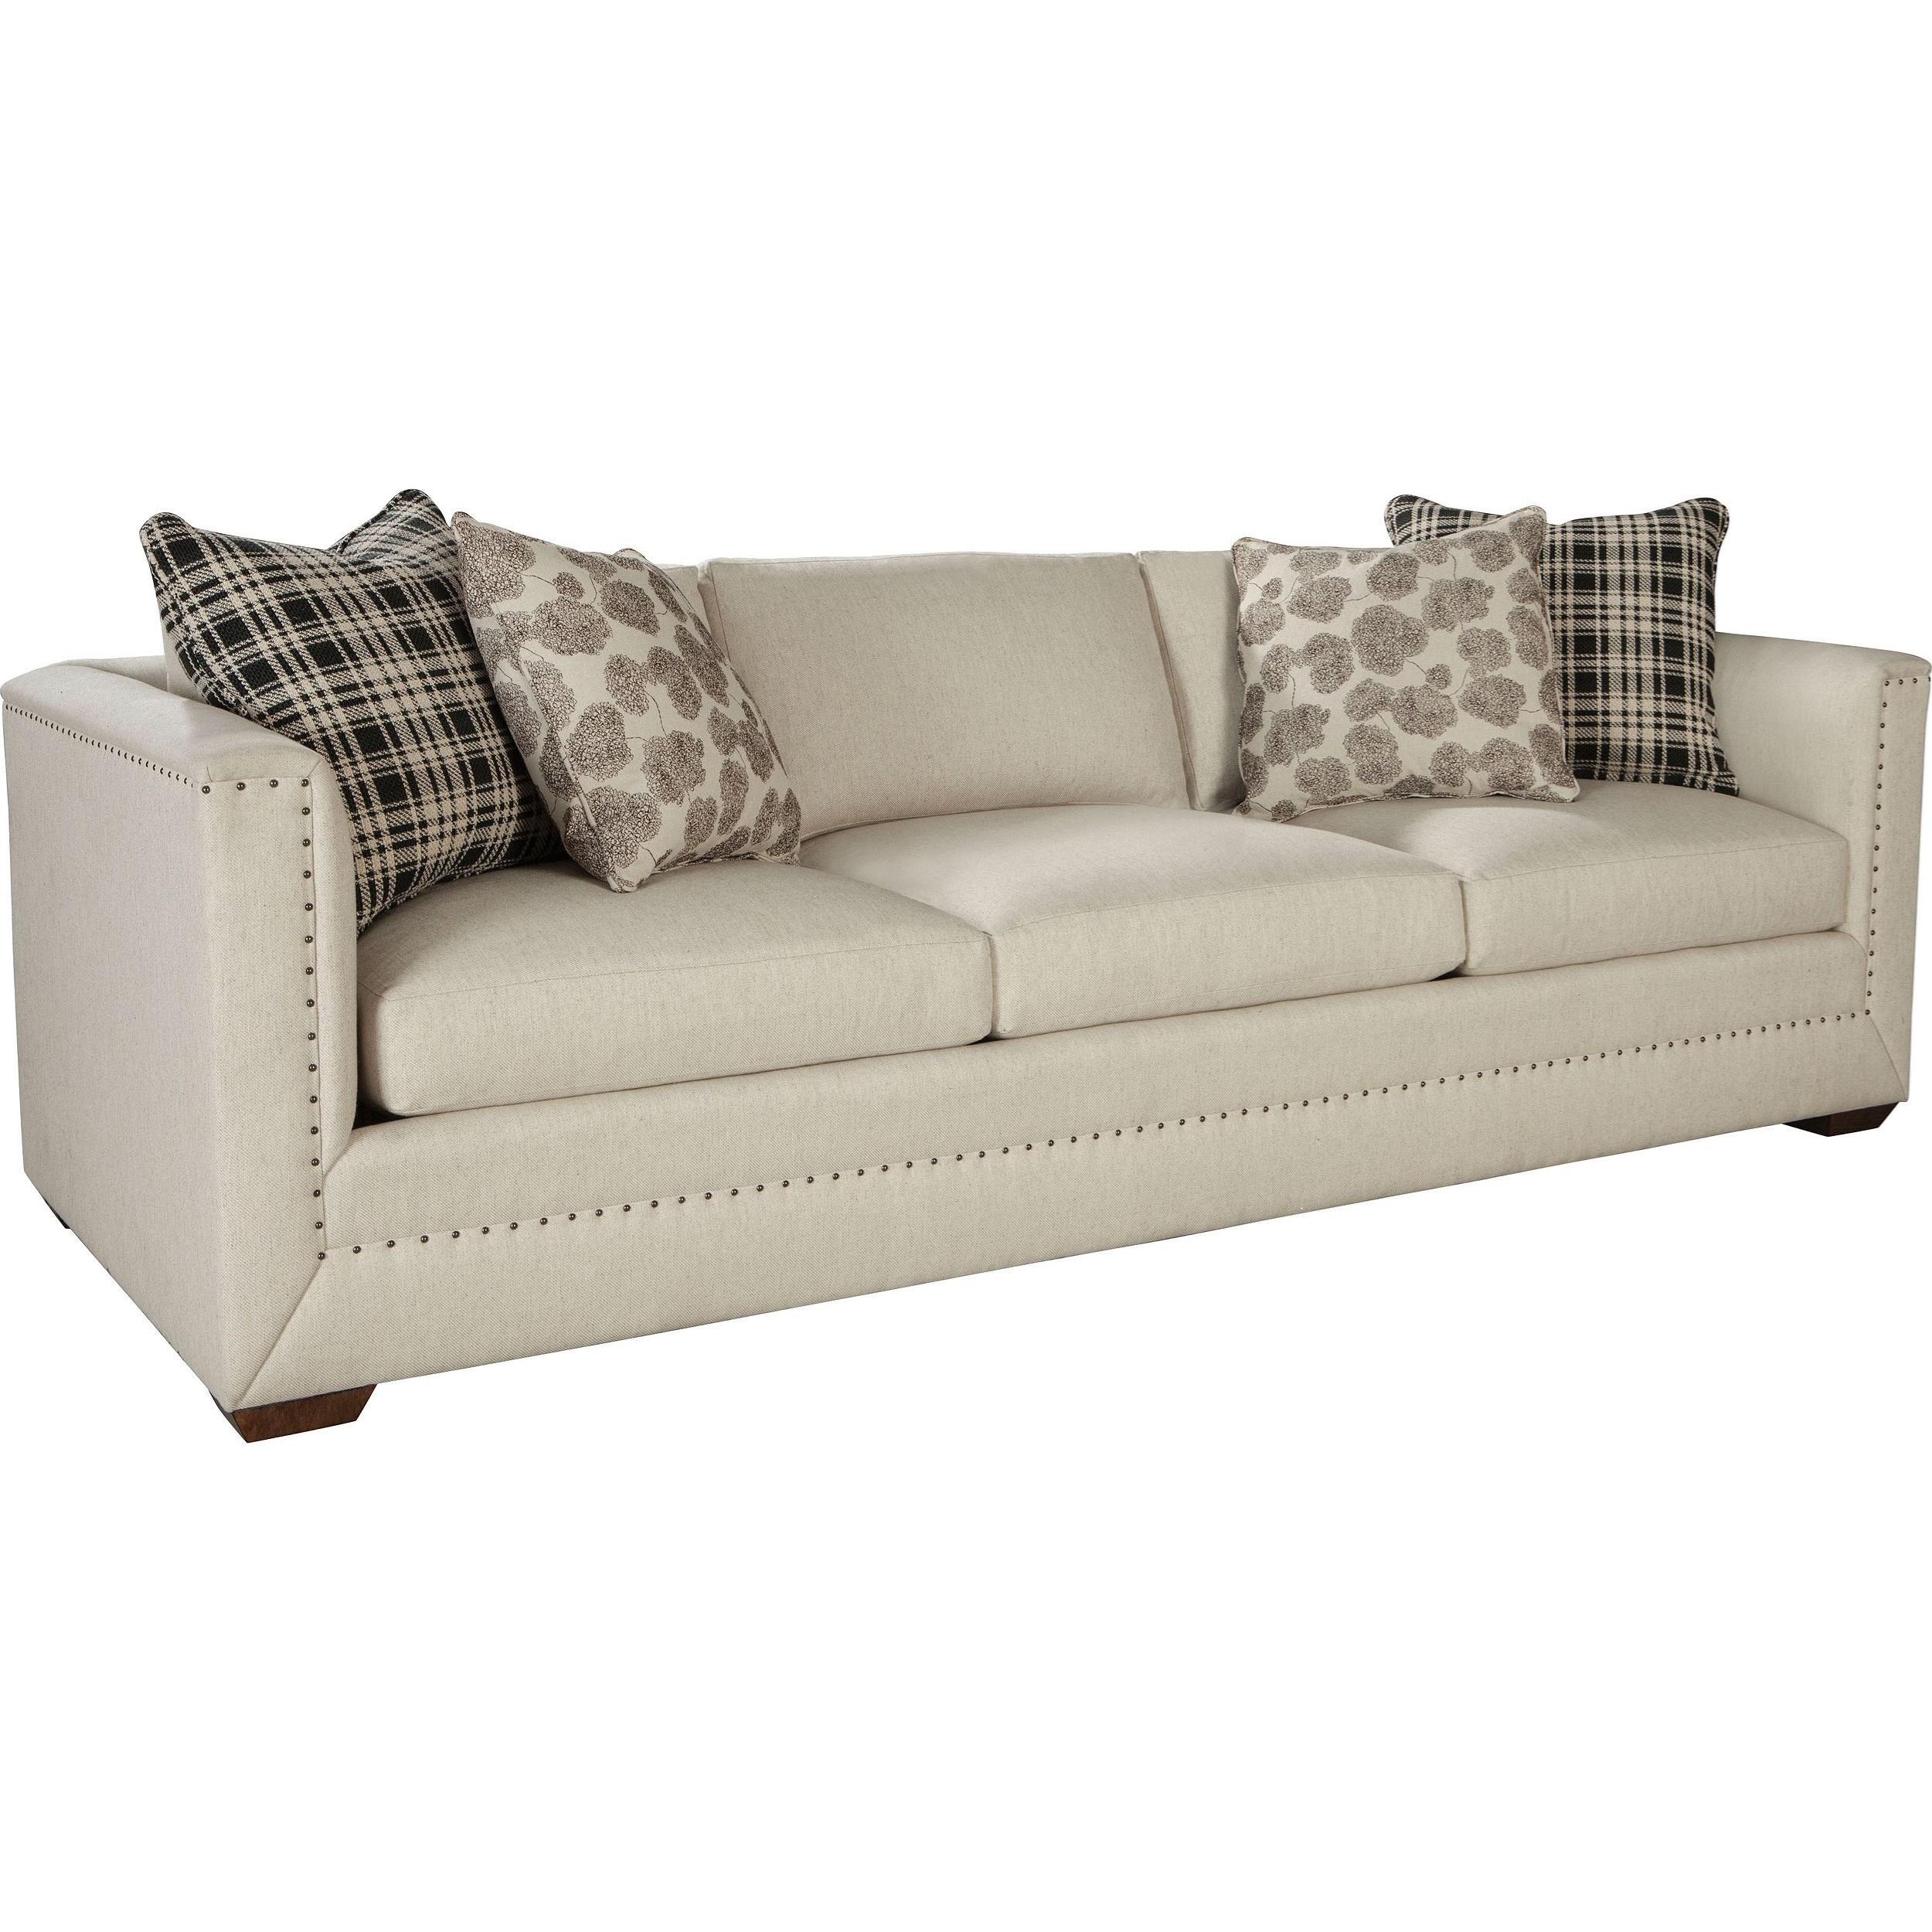 Ed ellen degeneres crafted by thomasville ellen degeneres for Thomasville living room furniture sale